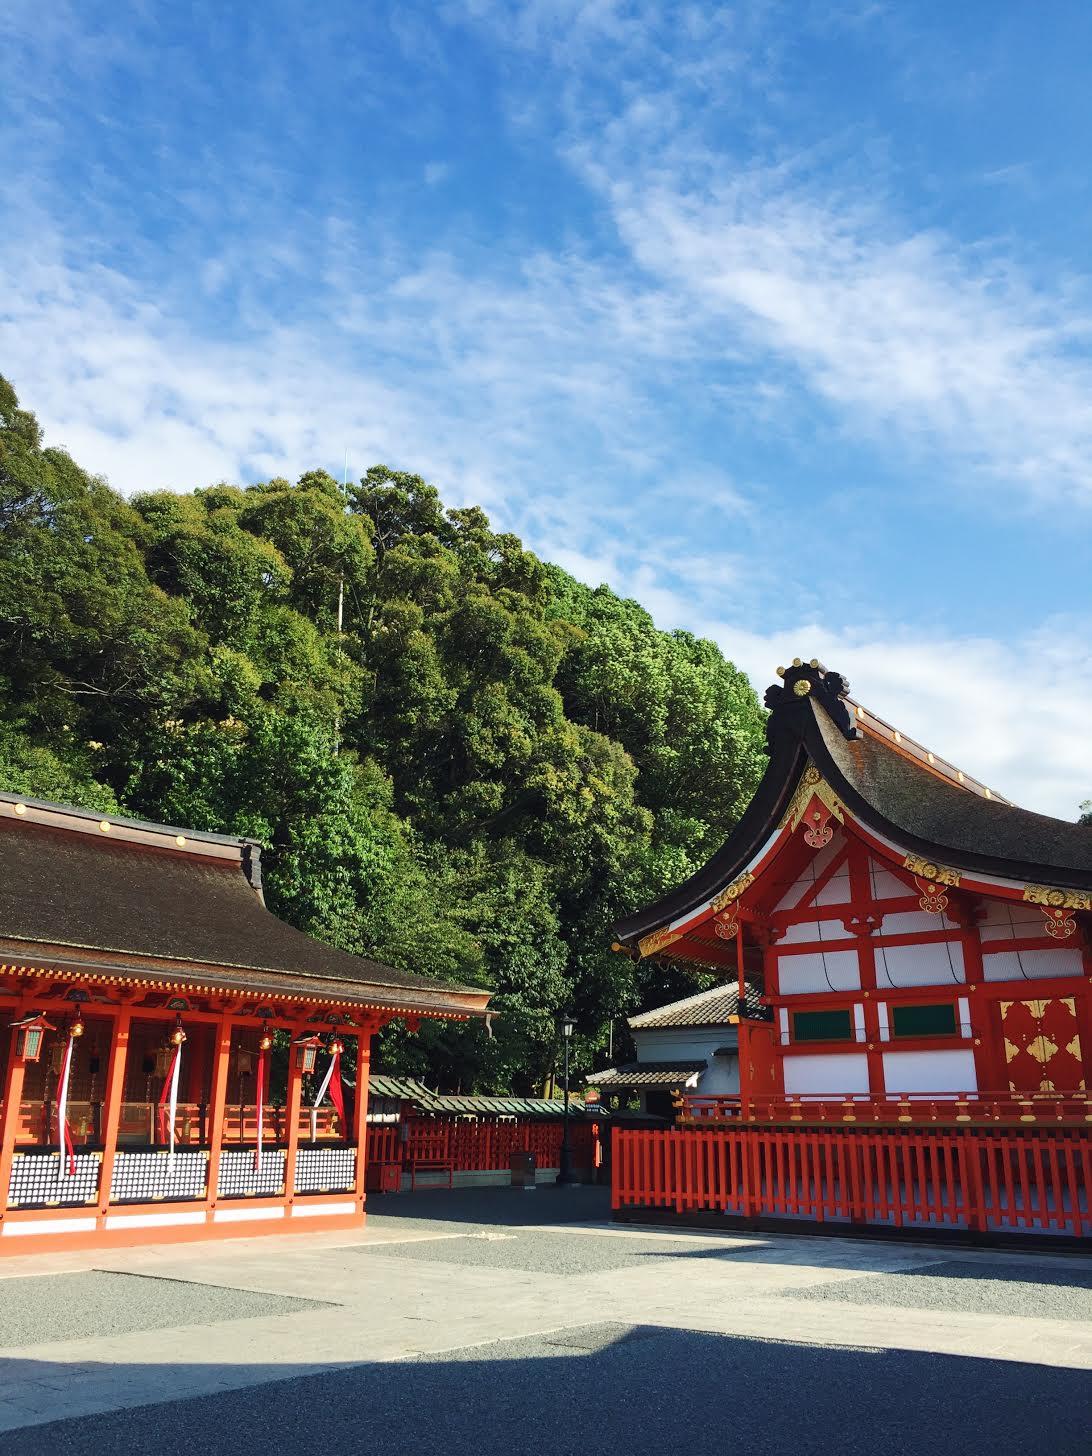 Muslim-travel-recommendations-Kyoto-Fushimi-Inari-Shrine.jpg